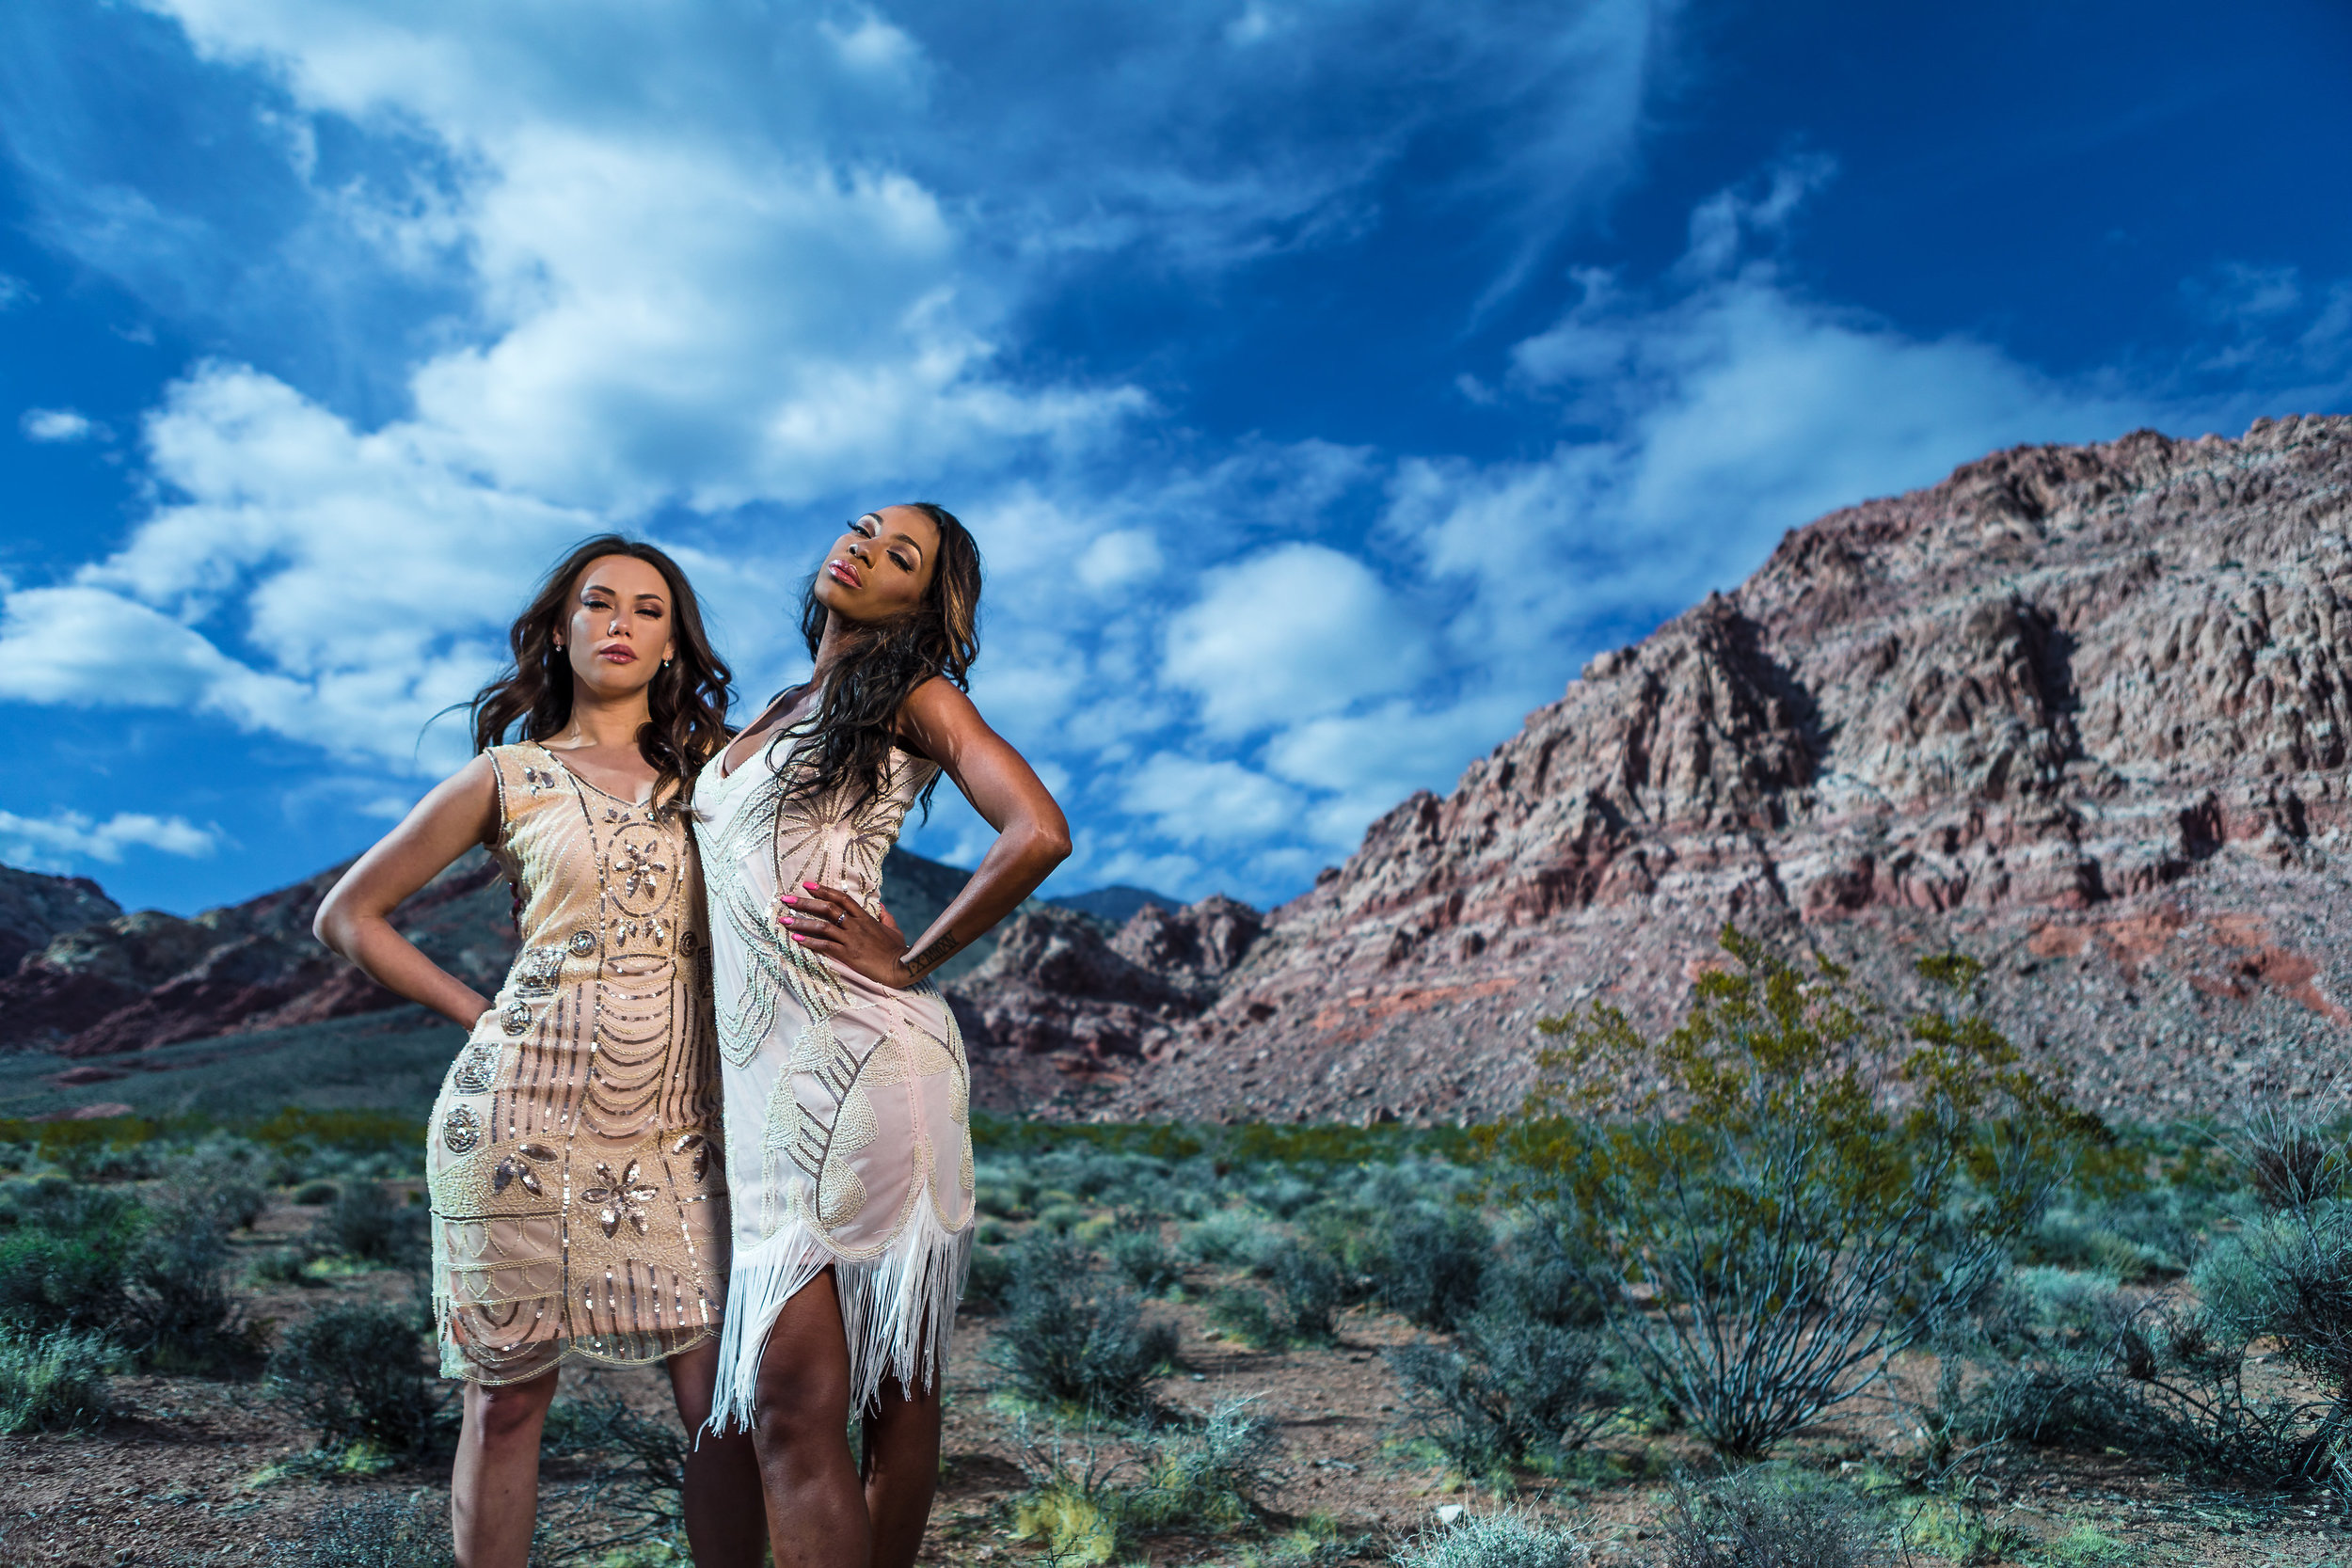 New_York_Photographer_Las_Vegas_Desert-121.jpg